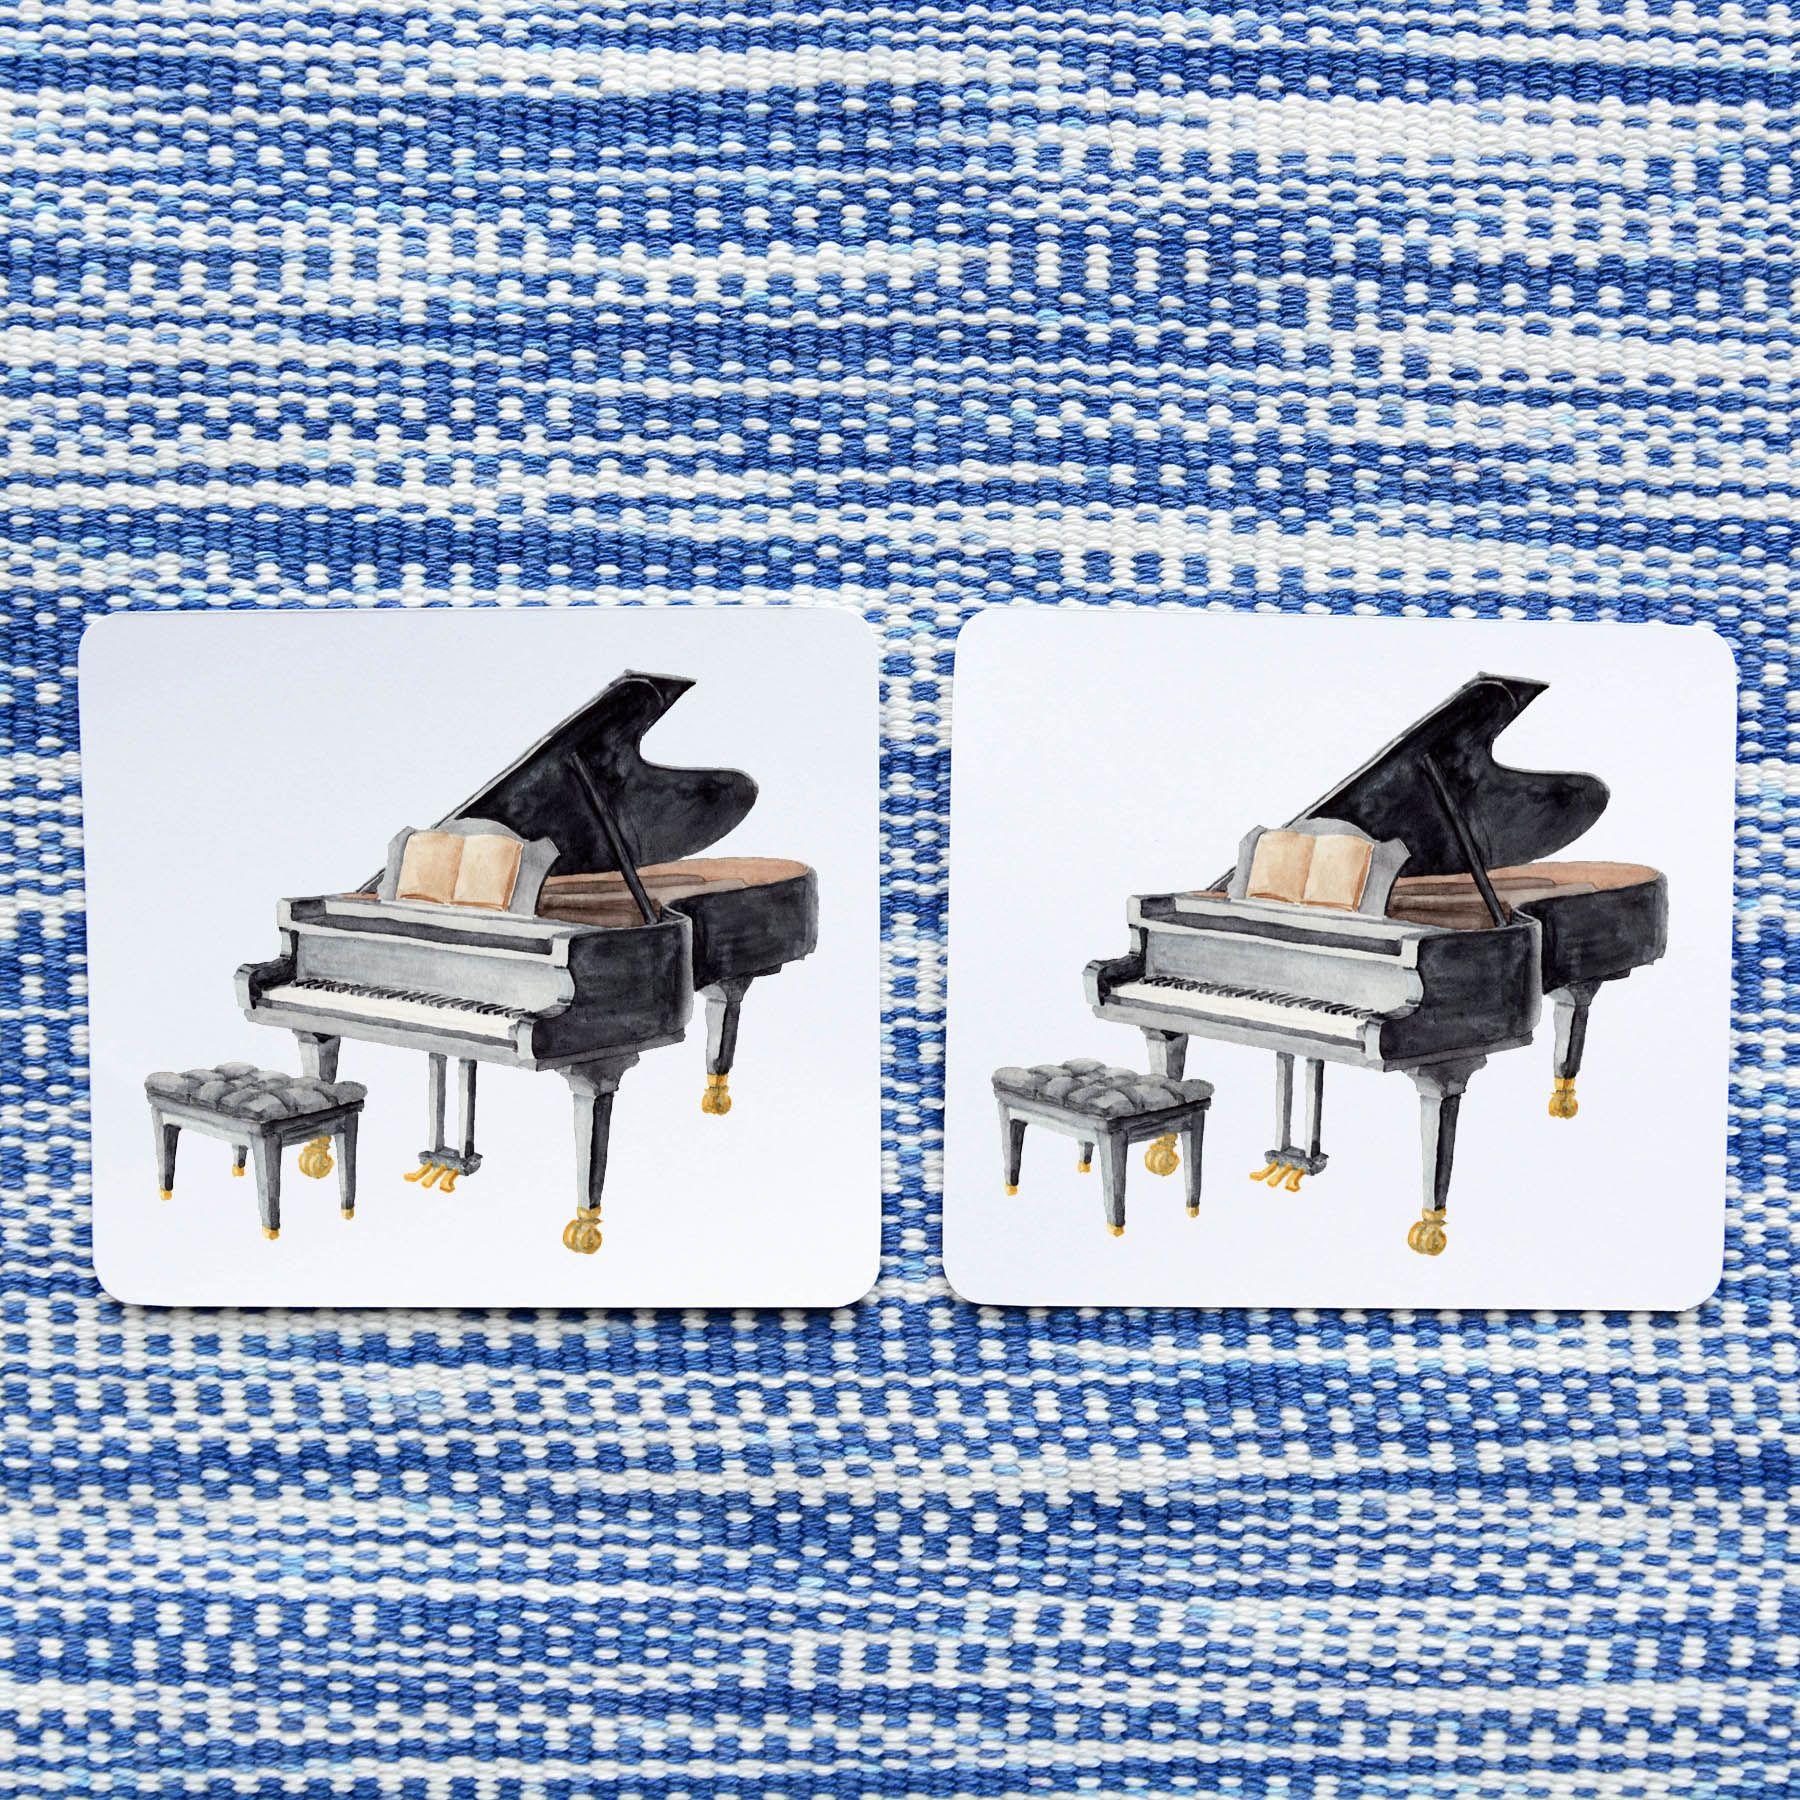 Matching Instruments